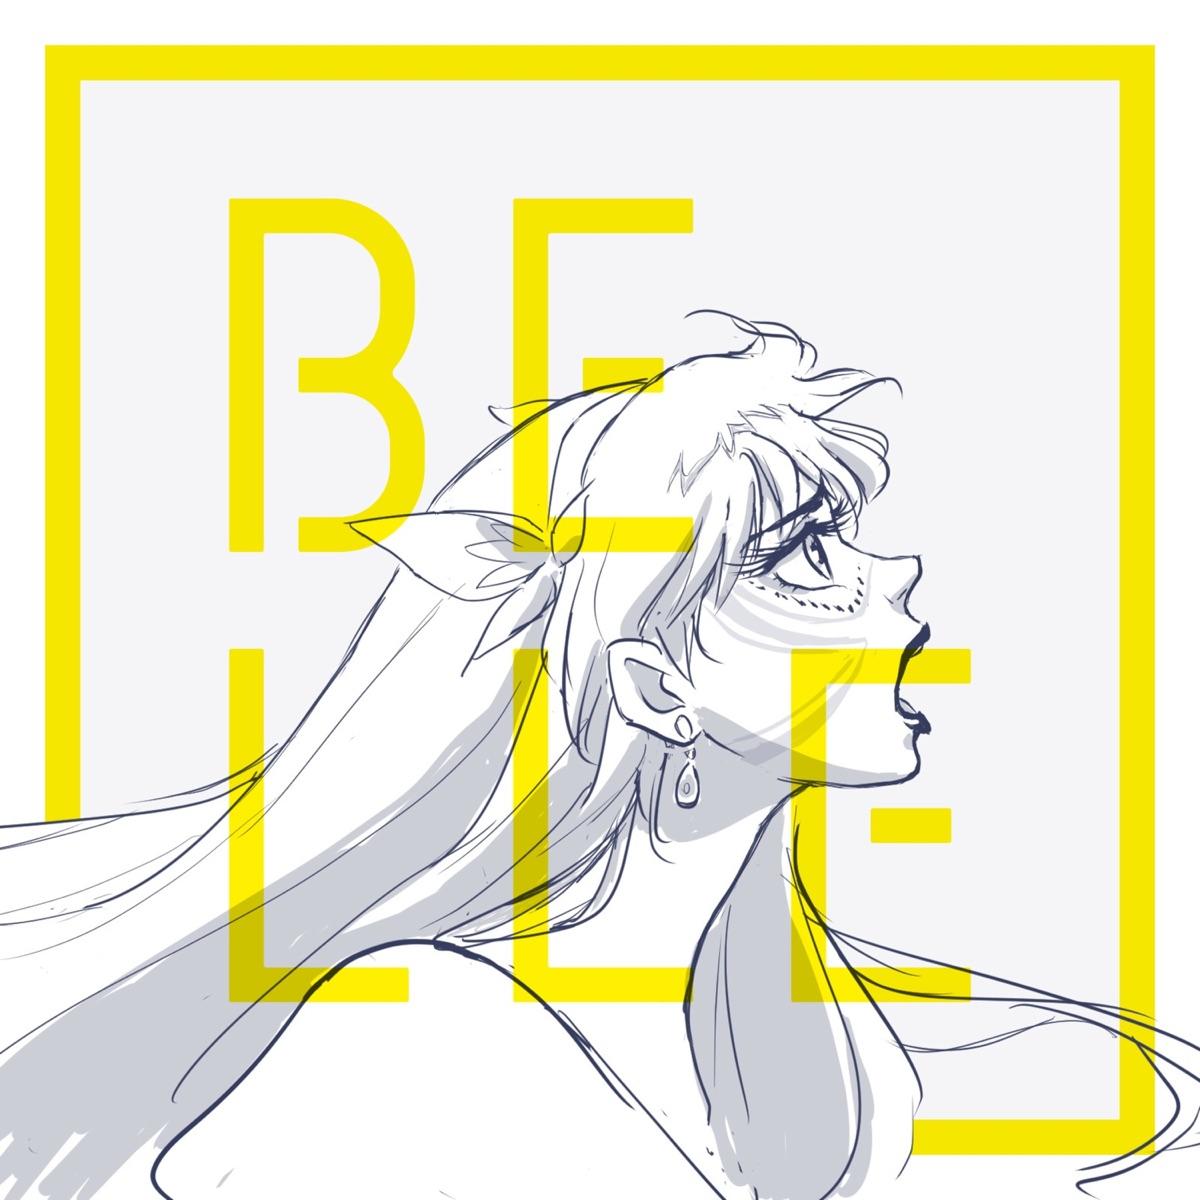 『Belle - 歌よ』収録の『歌よ』ジャケット